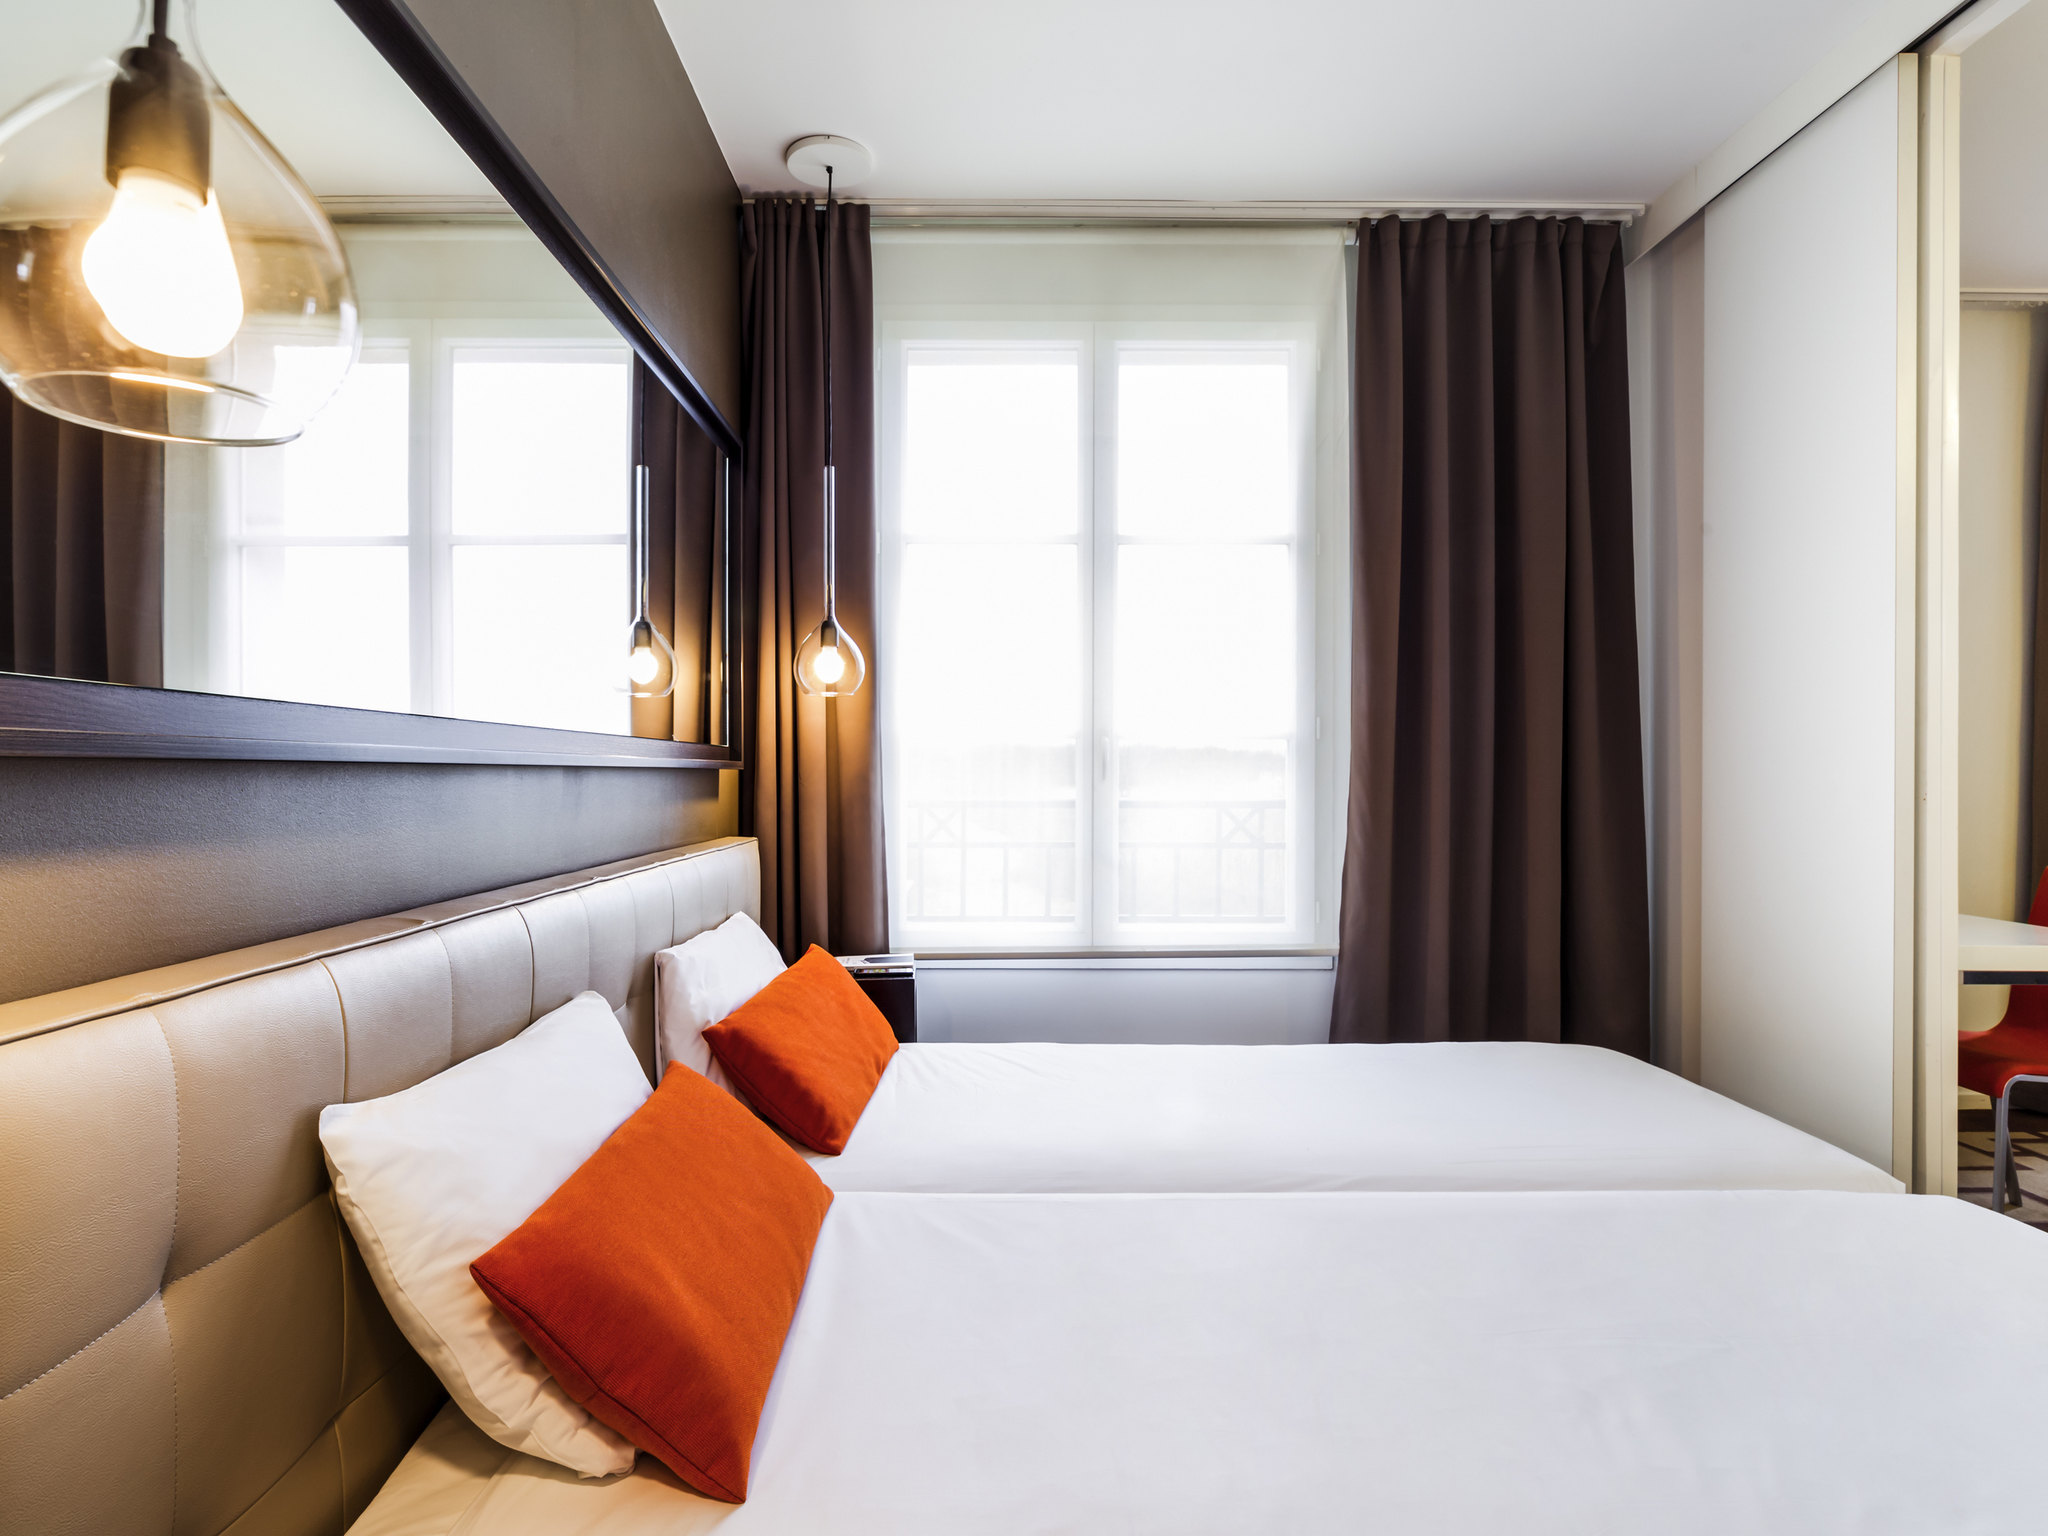 Hotel – Hipark by Adagio Marseille (opening: februari 2018)